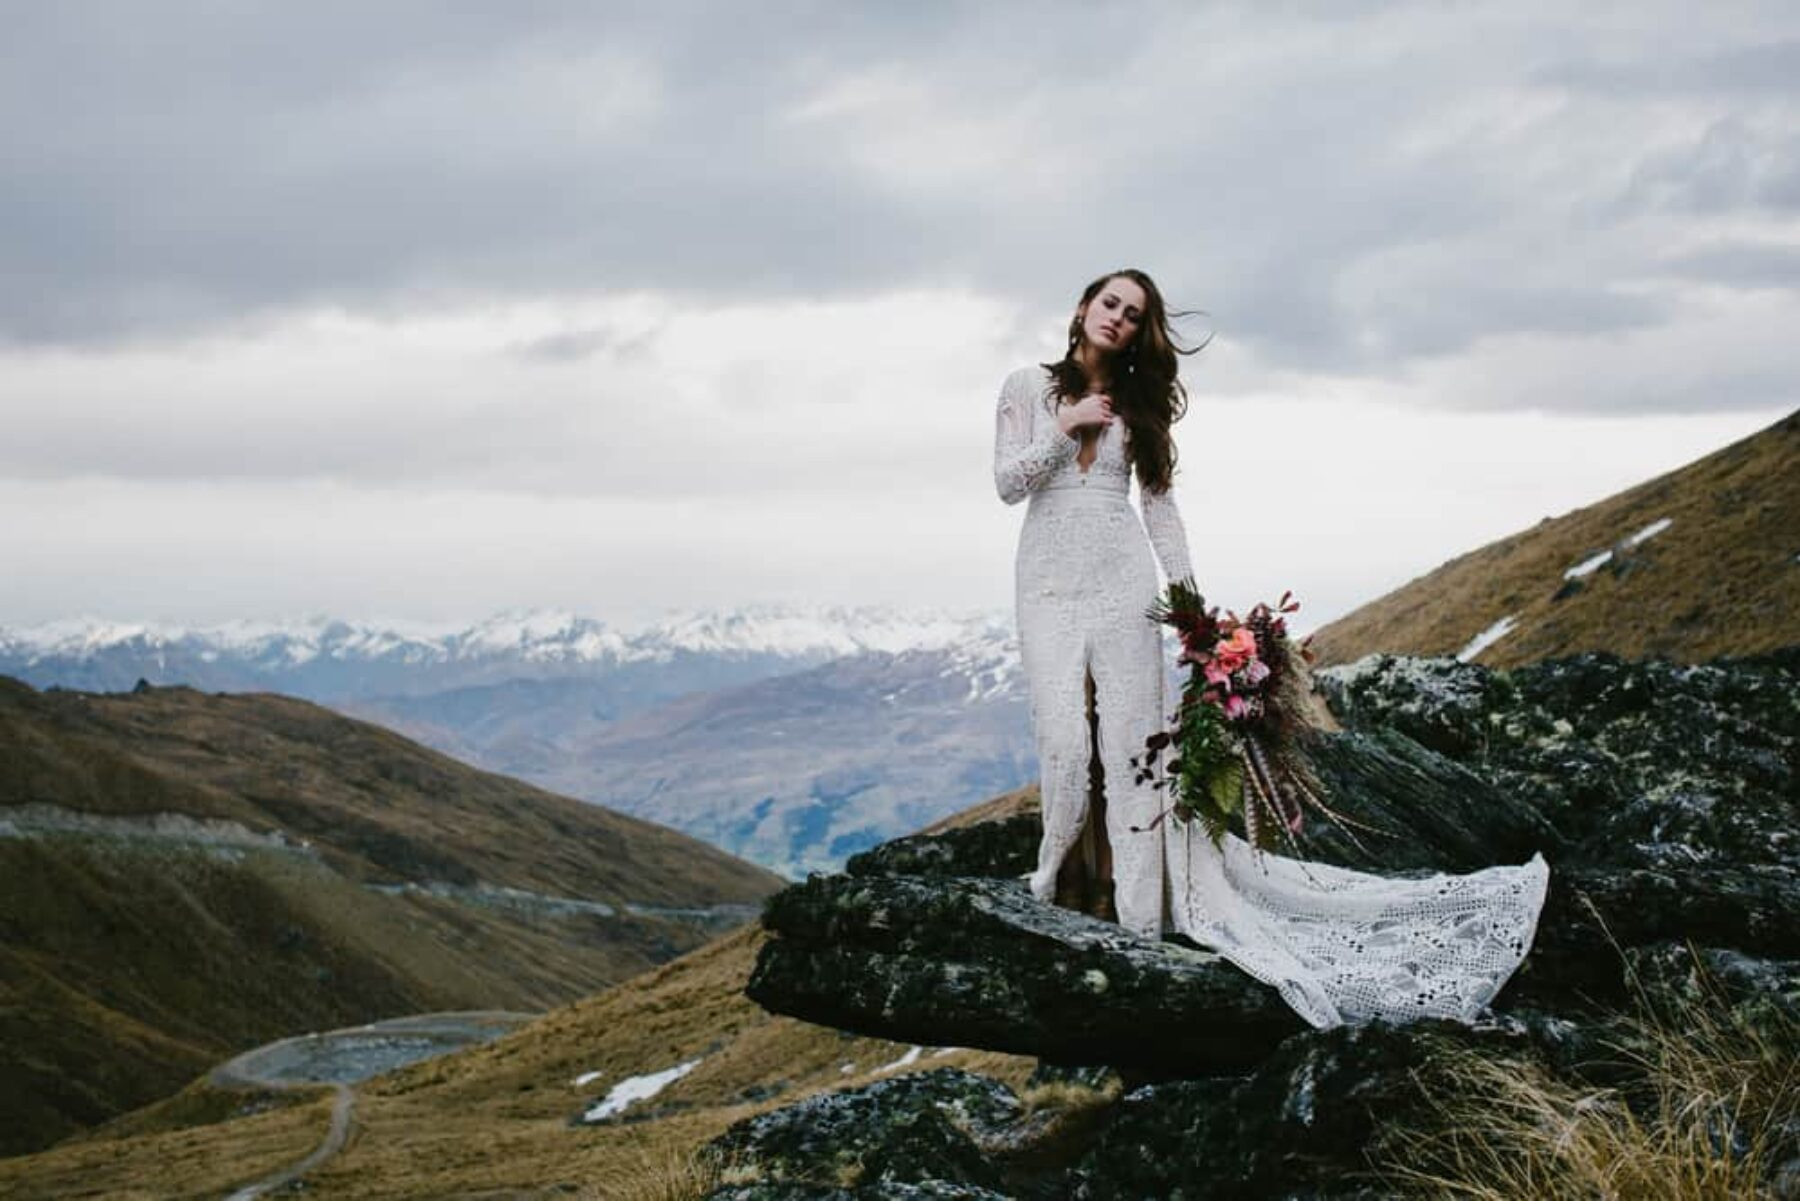 boho mountain wedding - photography by Bonnie Jenkins